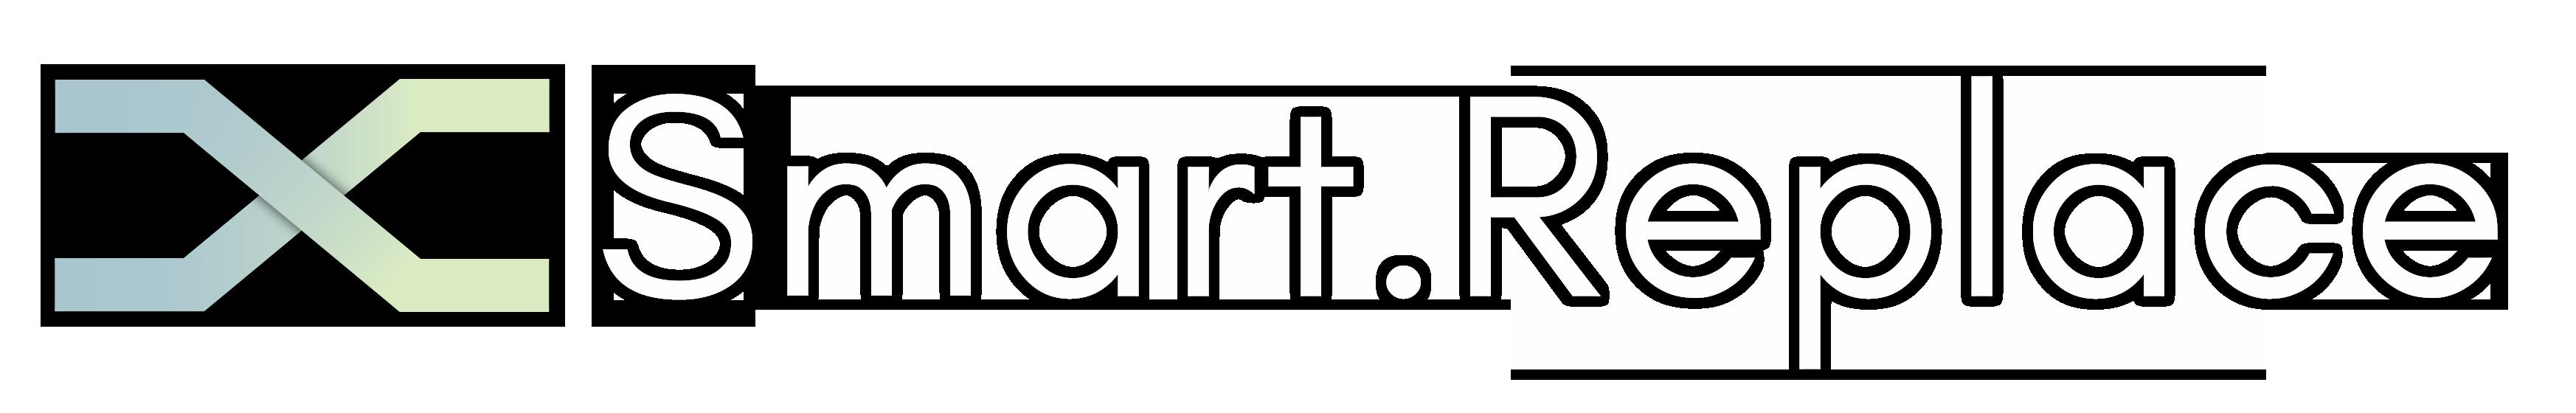 Smart Replace - UnityList